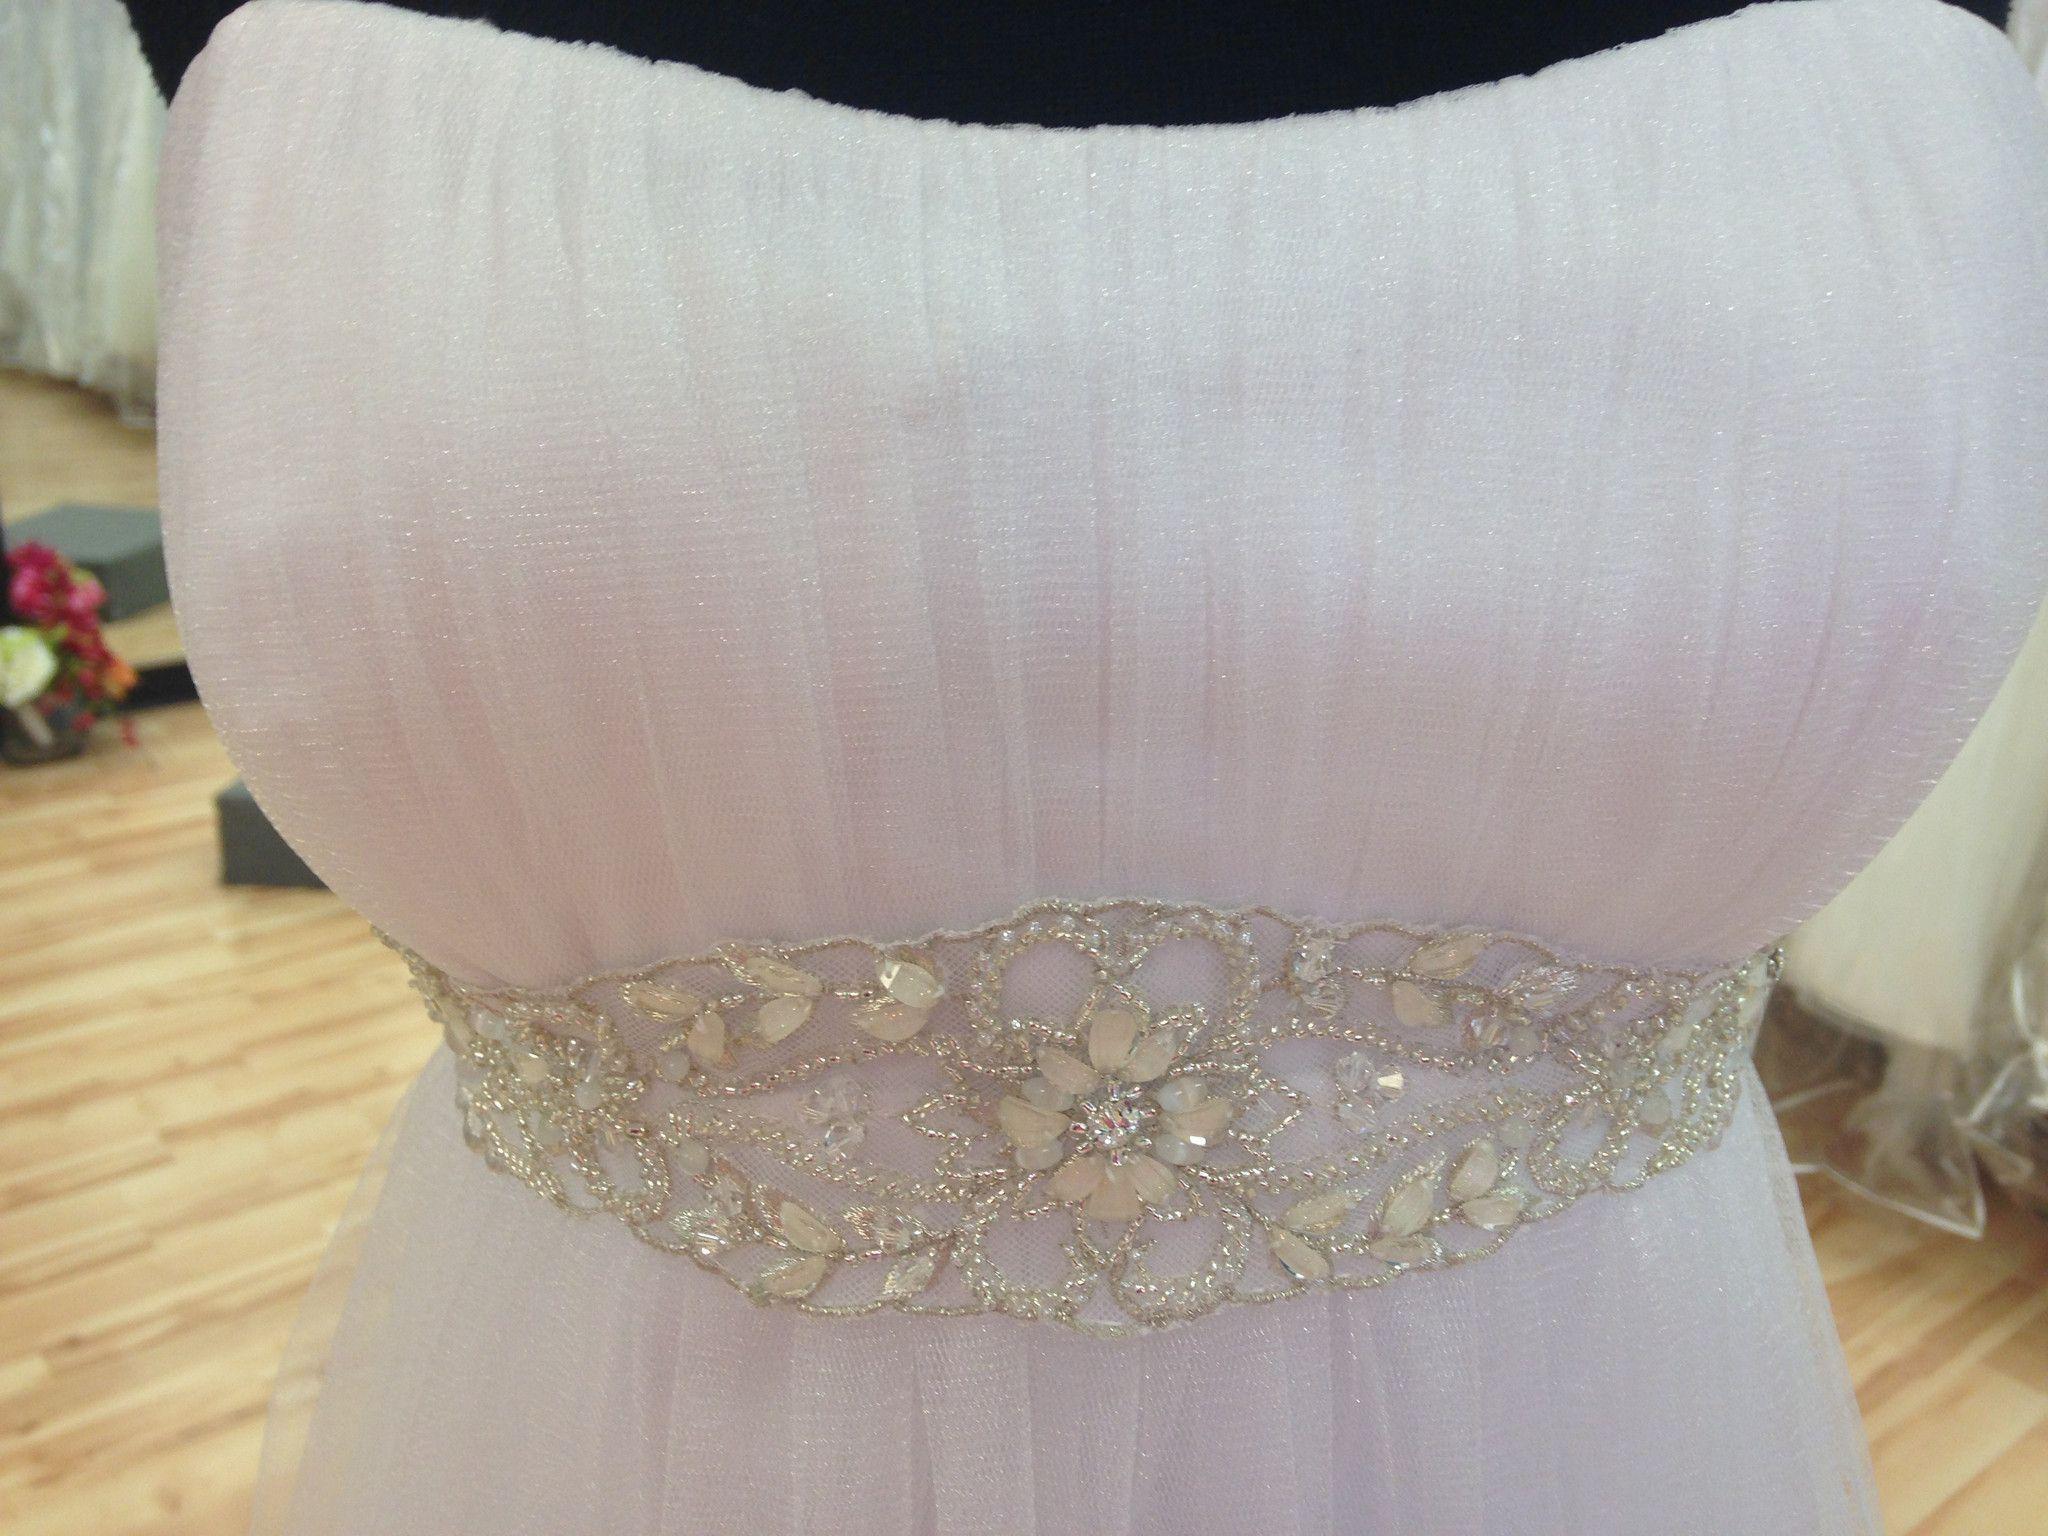 Tulle sheath wedding dress wedding pinterest wedding dress